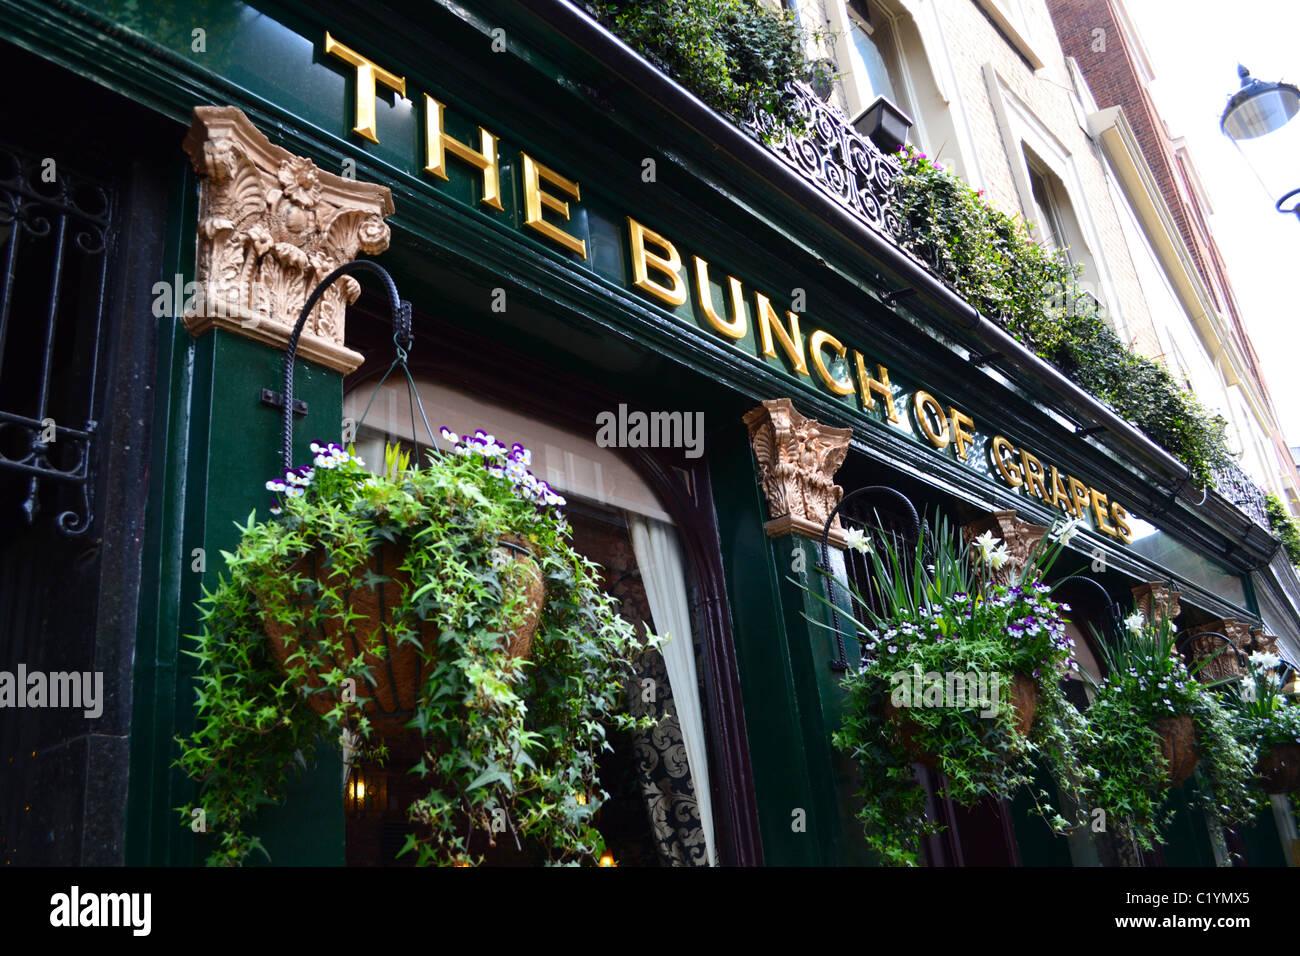 'The Bunch Of Grapes' pub, Knightsbridge, London - Stock Image